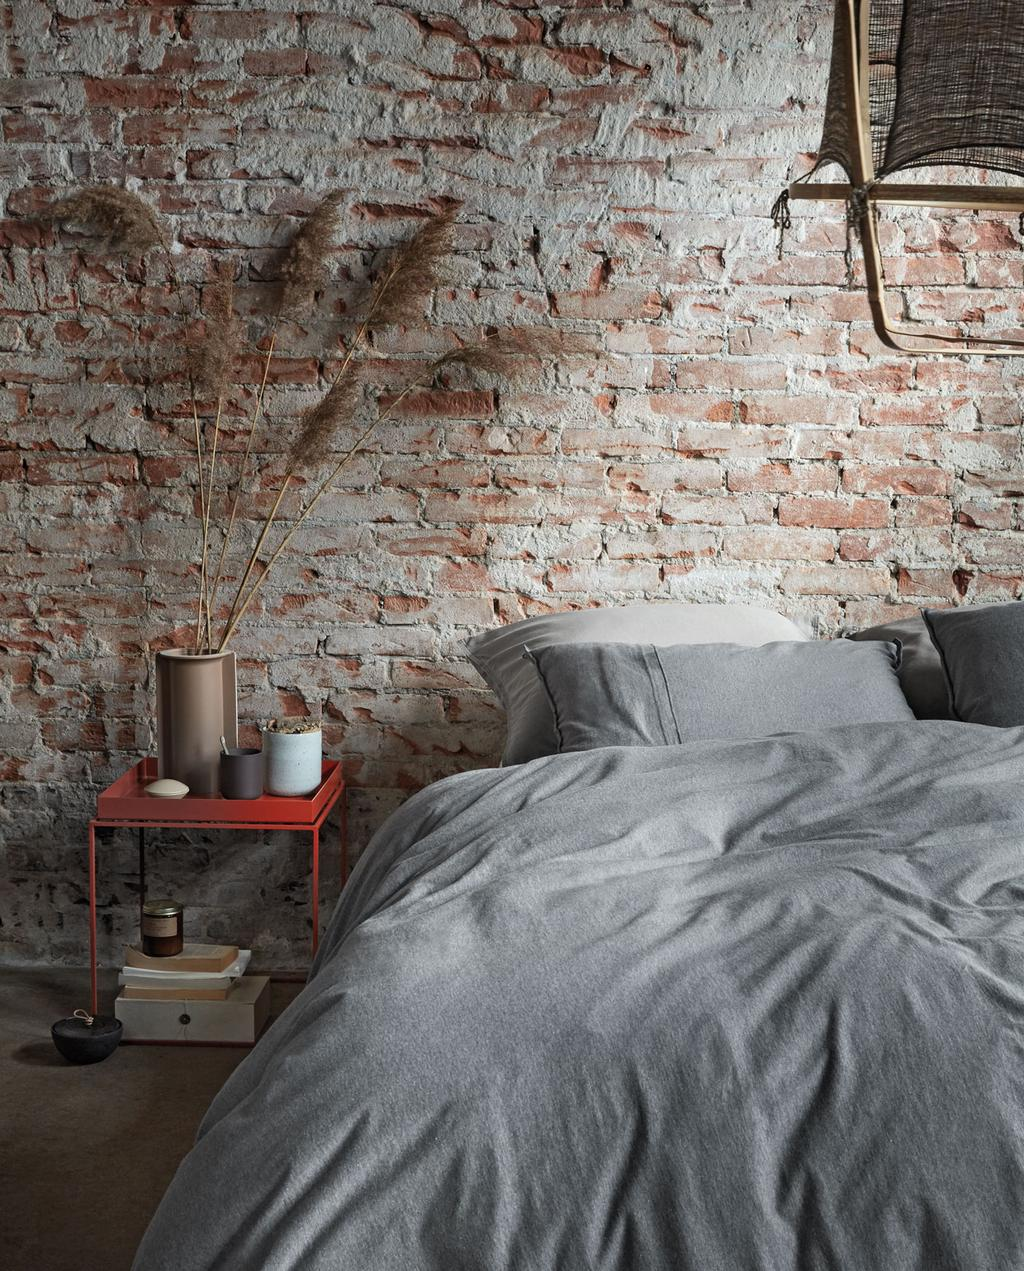 vtwonen 10-2019 | grijs bedlinnen slaapkamer stenenmuur